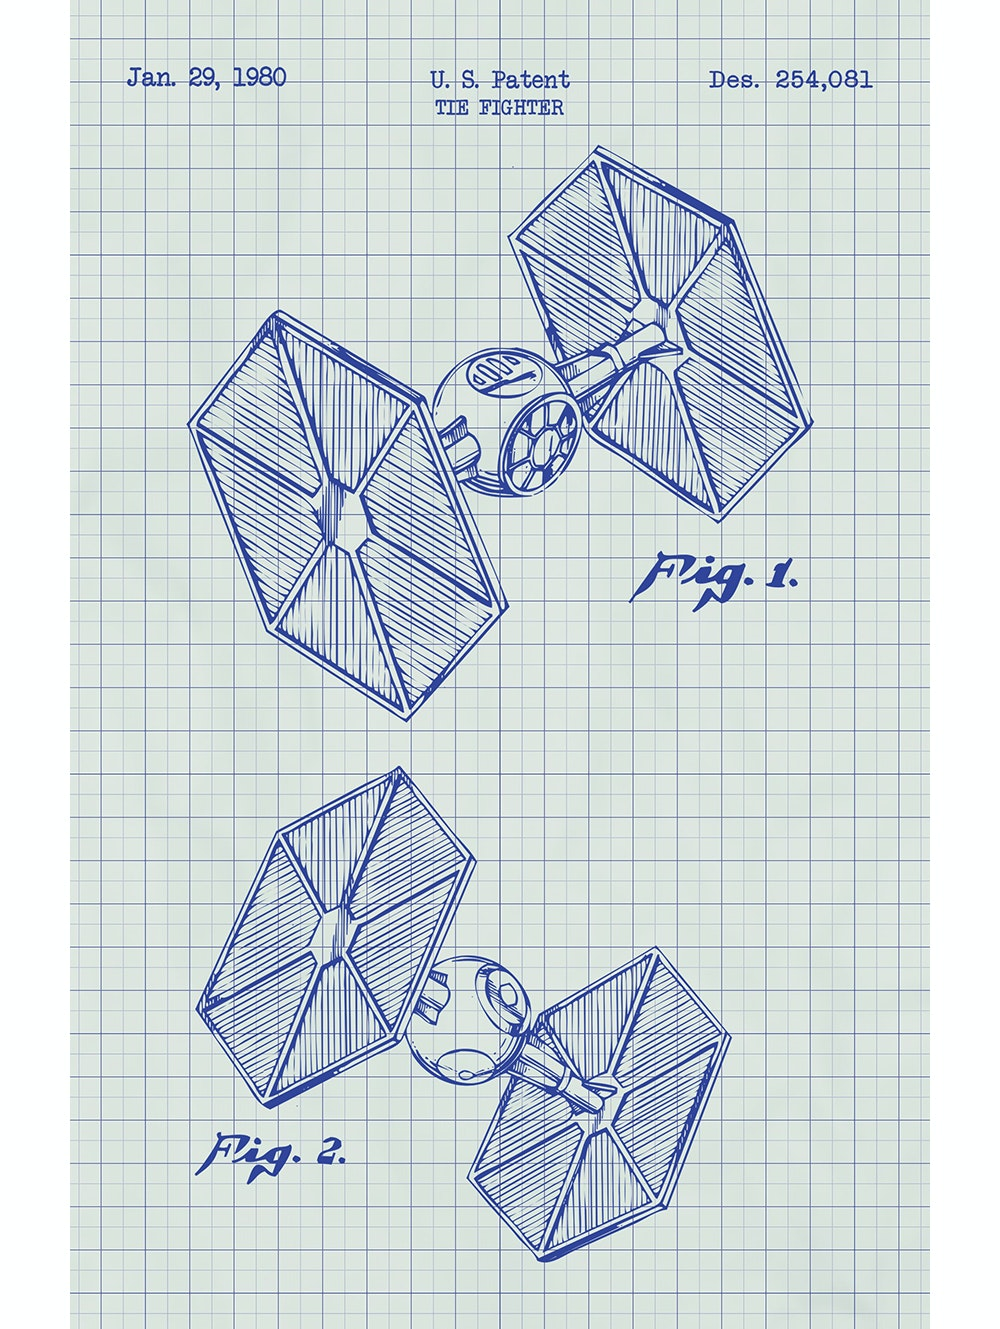 Star Wars - Tie Fighter - 254,081 (Vertical Print)